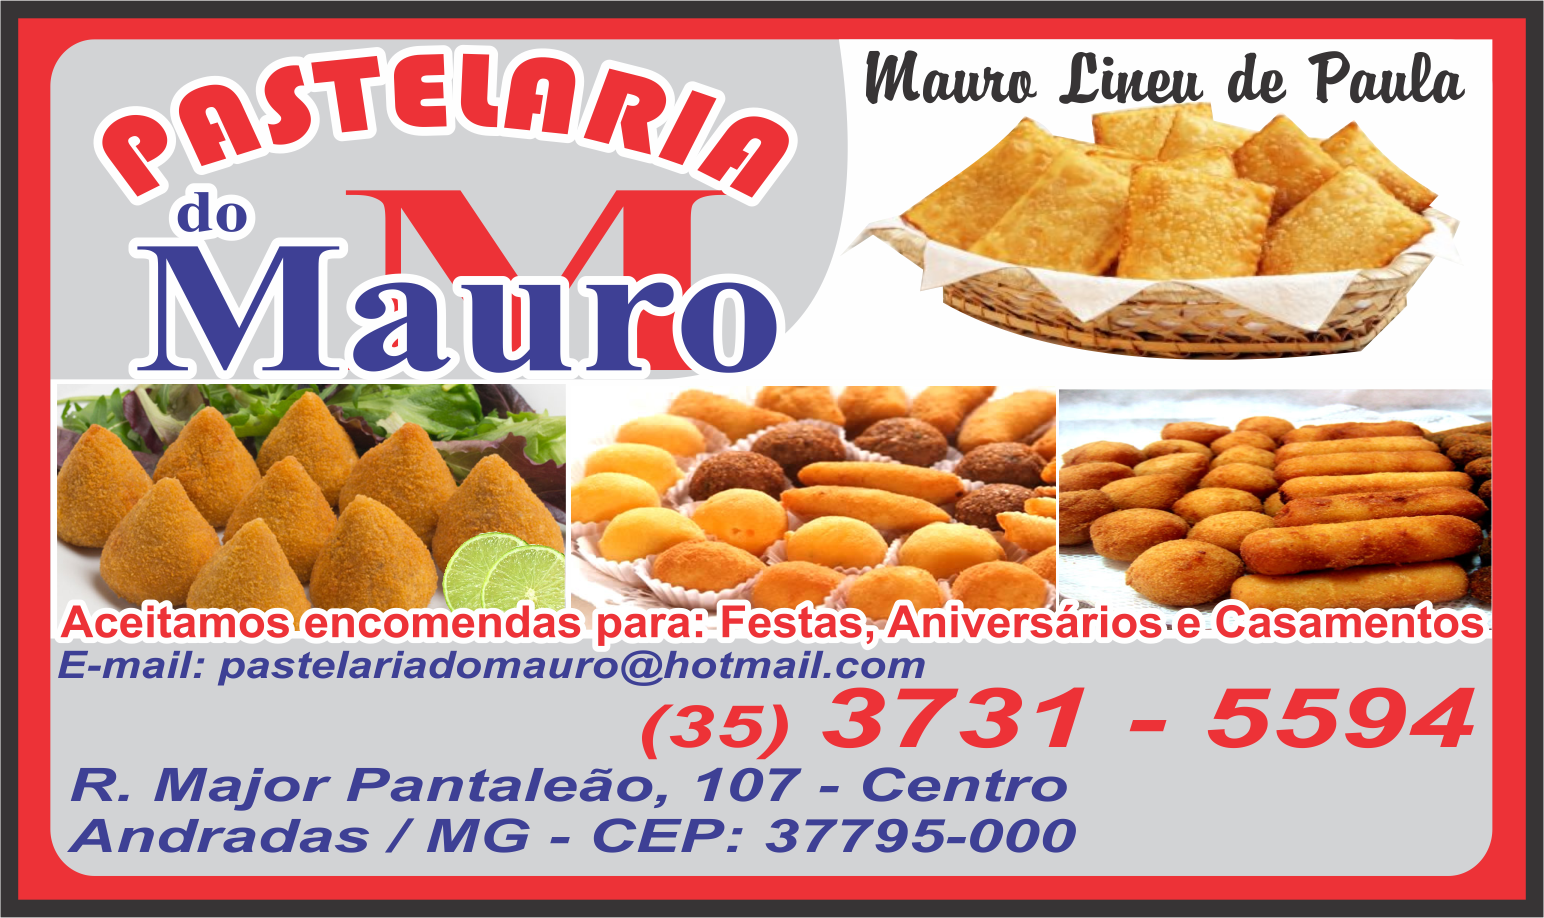 PASTELARIA DO MAURO ANDRADAS